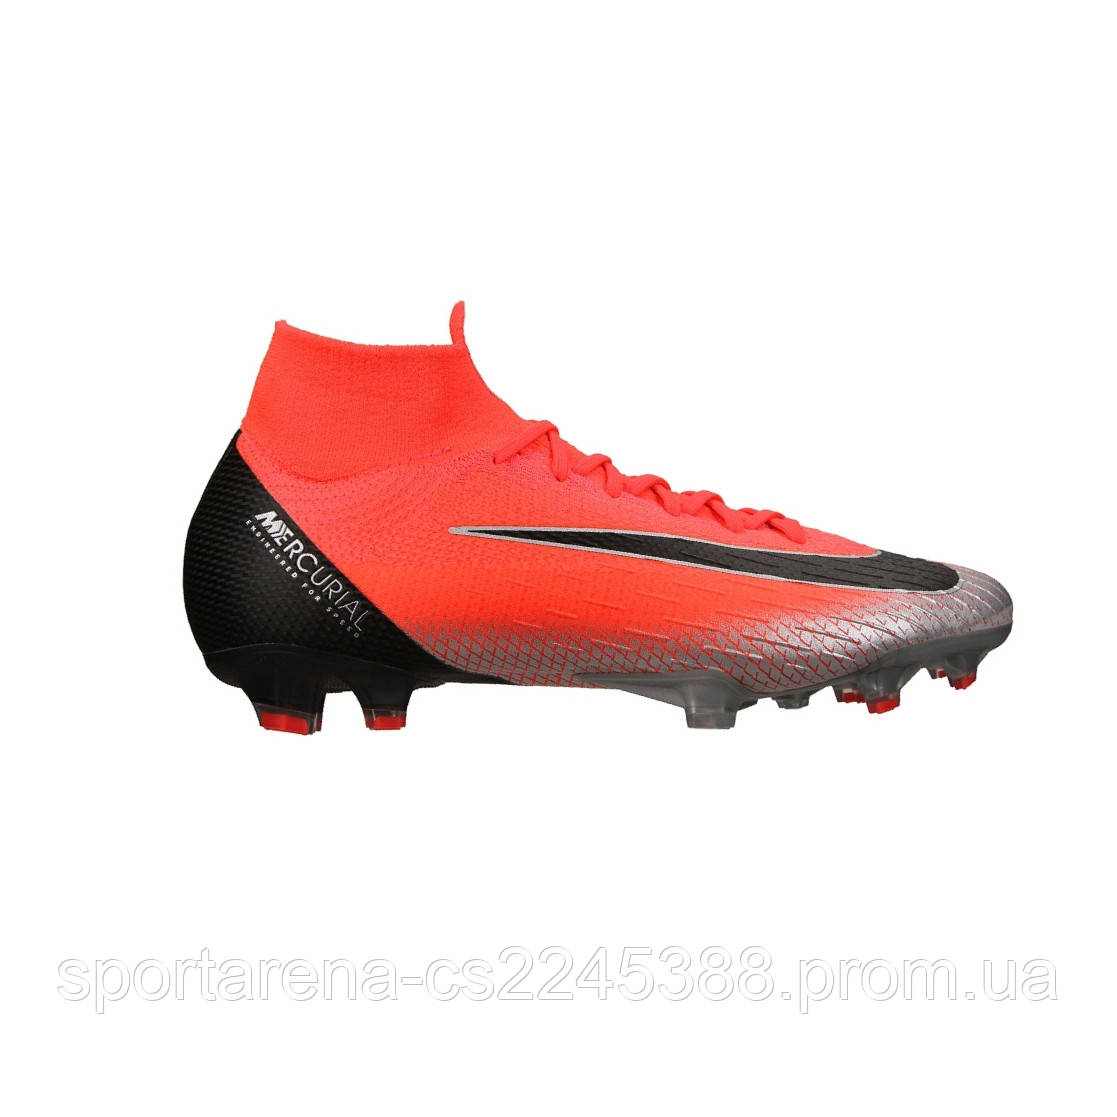 Бутсы Nike Superfly 6 Elite CR7 FG AJ3547-600  продажа ffadb42d25ad1